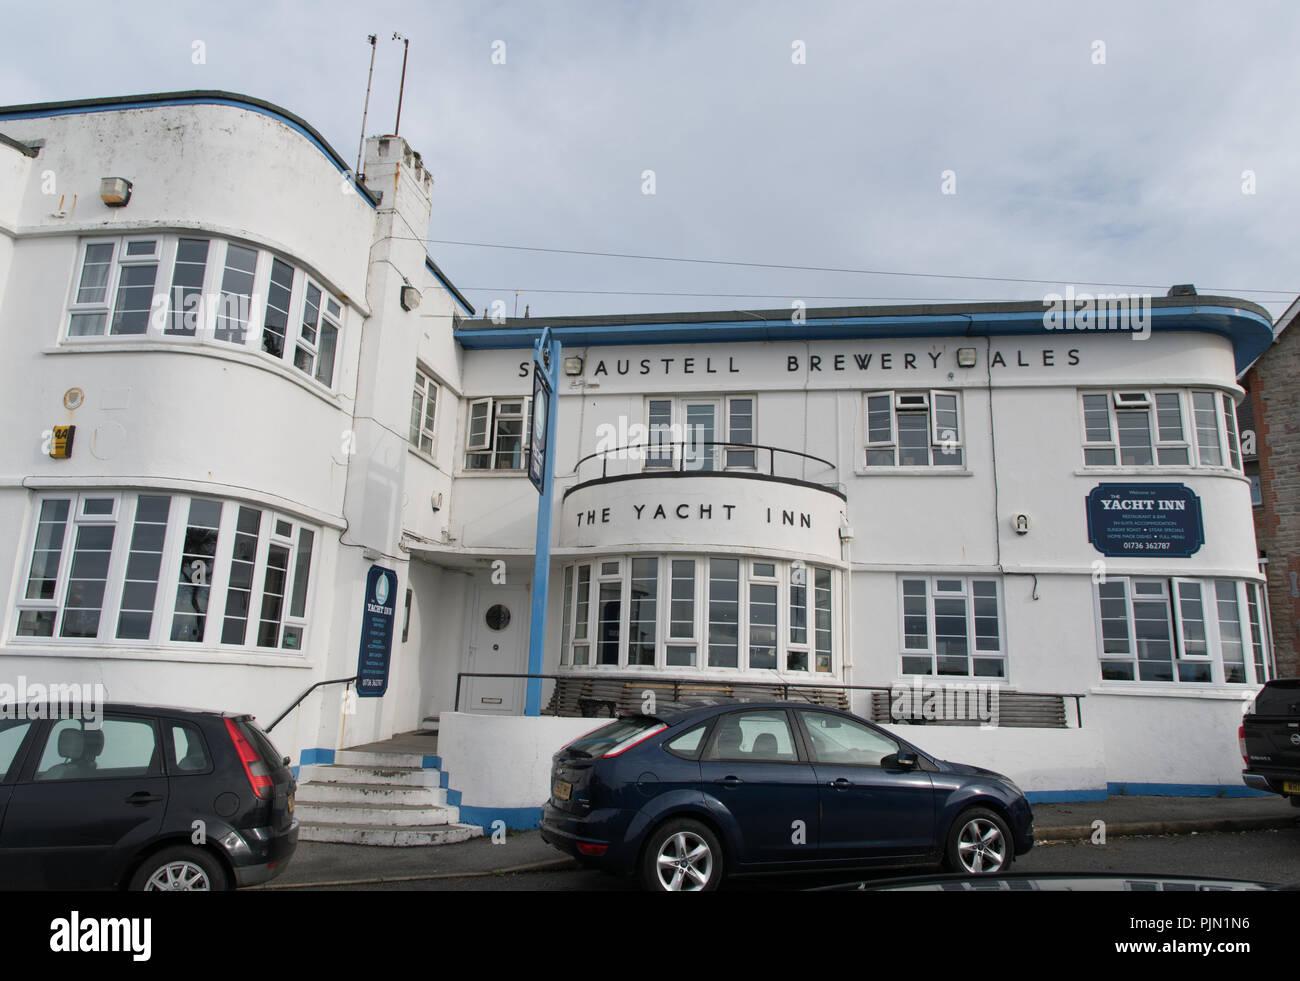 Yacht Inn at Penzance - Stock Image